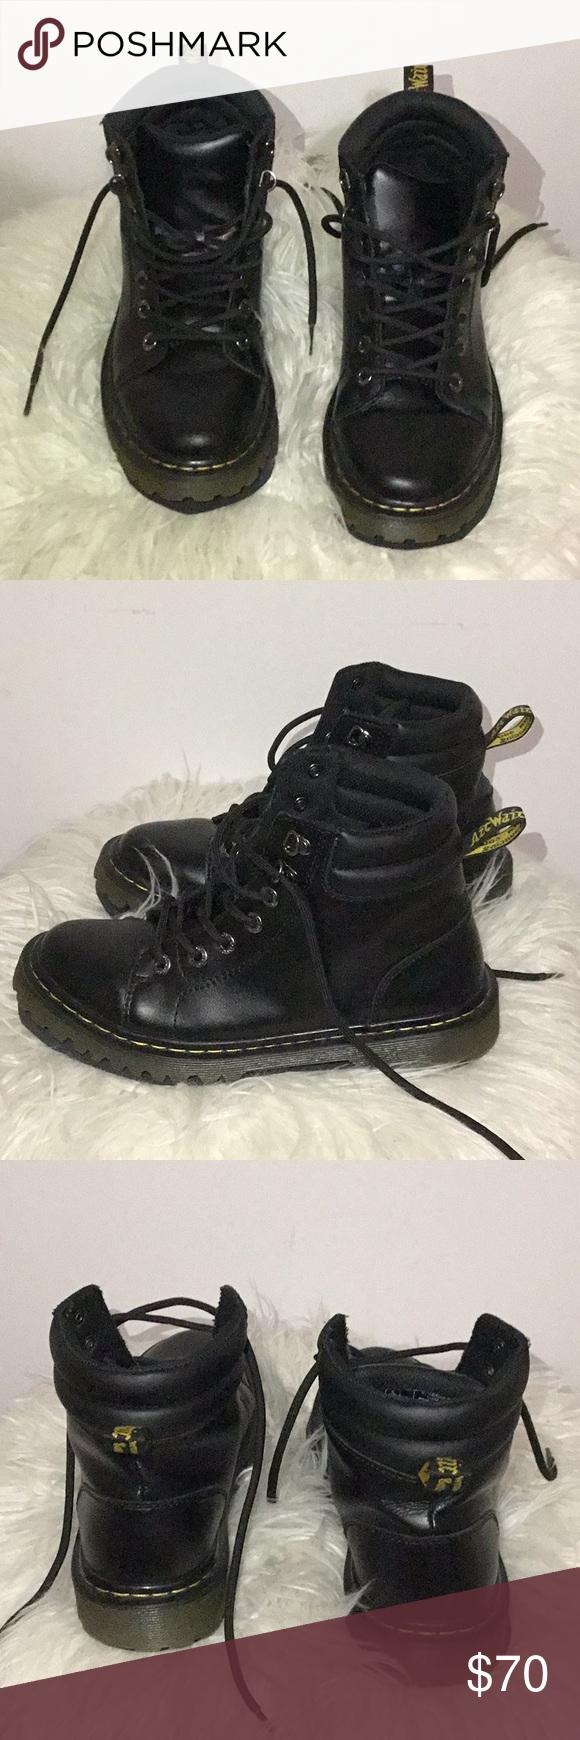 34ff8b375378 Dr Martens Faora Faora black combat boot. Worn a hand full of times ...